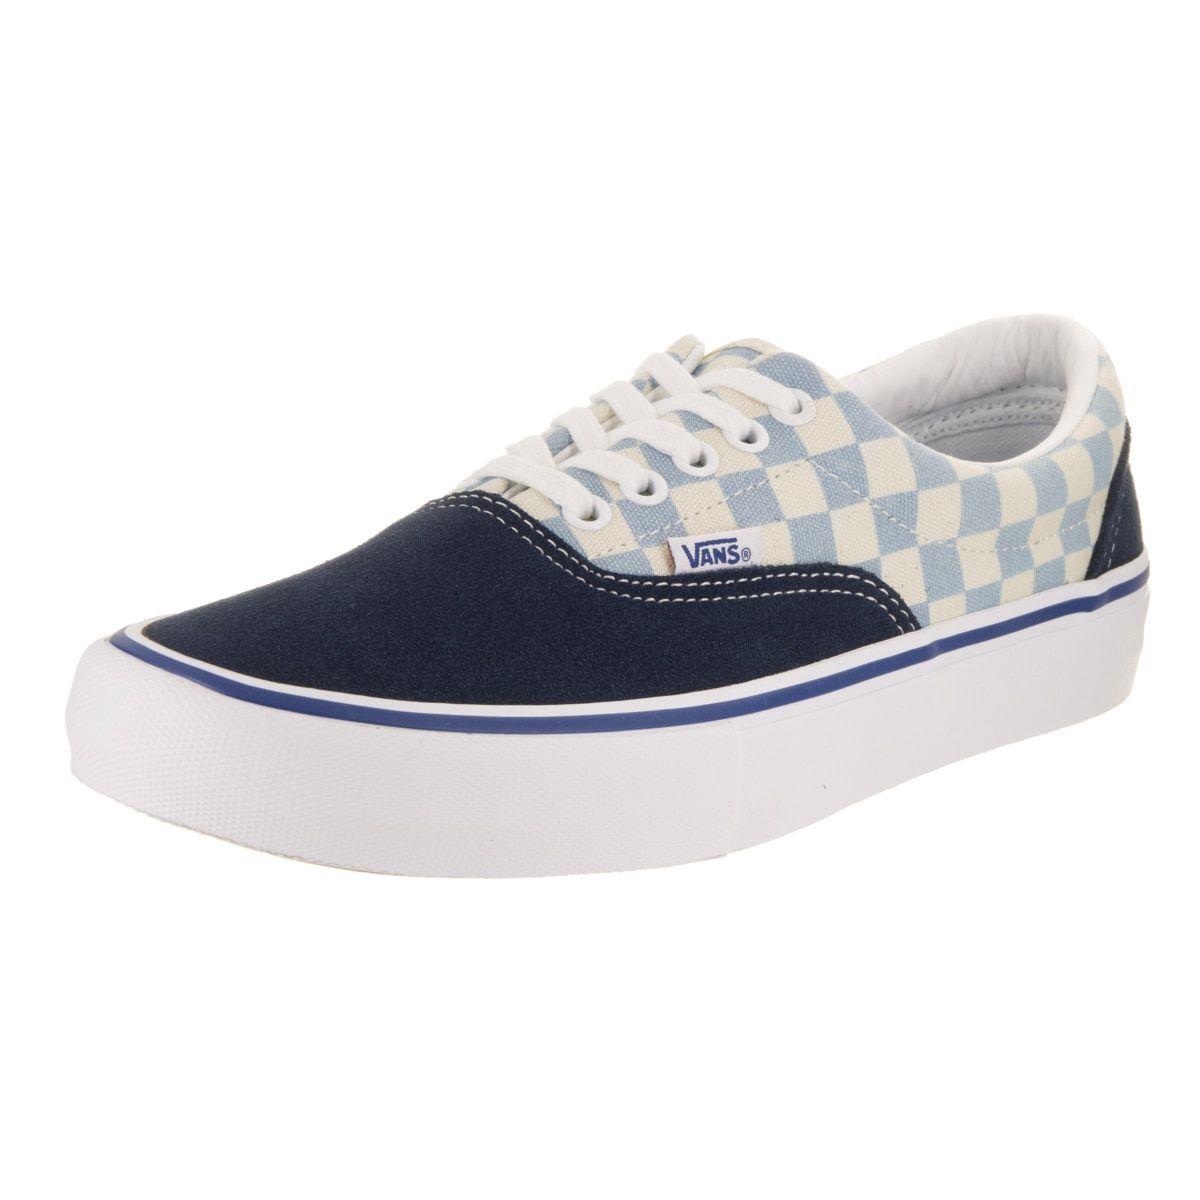 20d68ccbbb Vans Men s Era Pro Checkerboard Skate Shoes